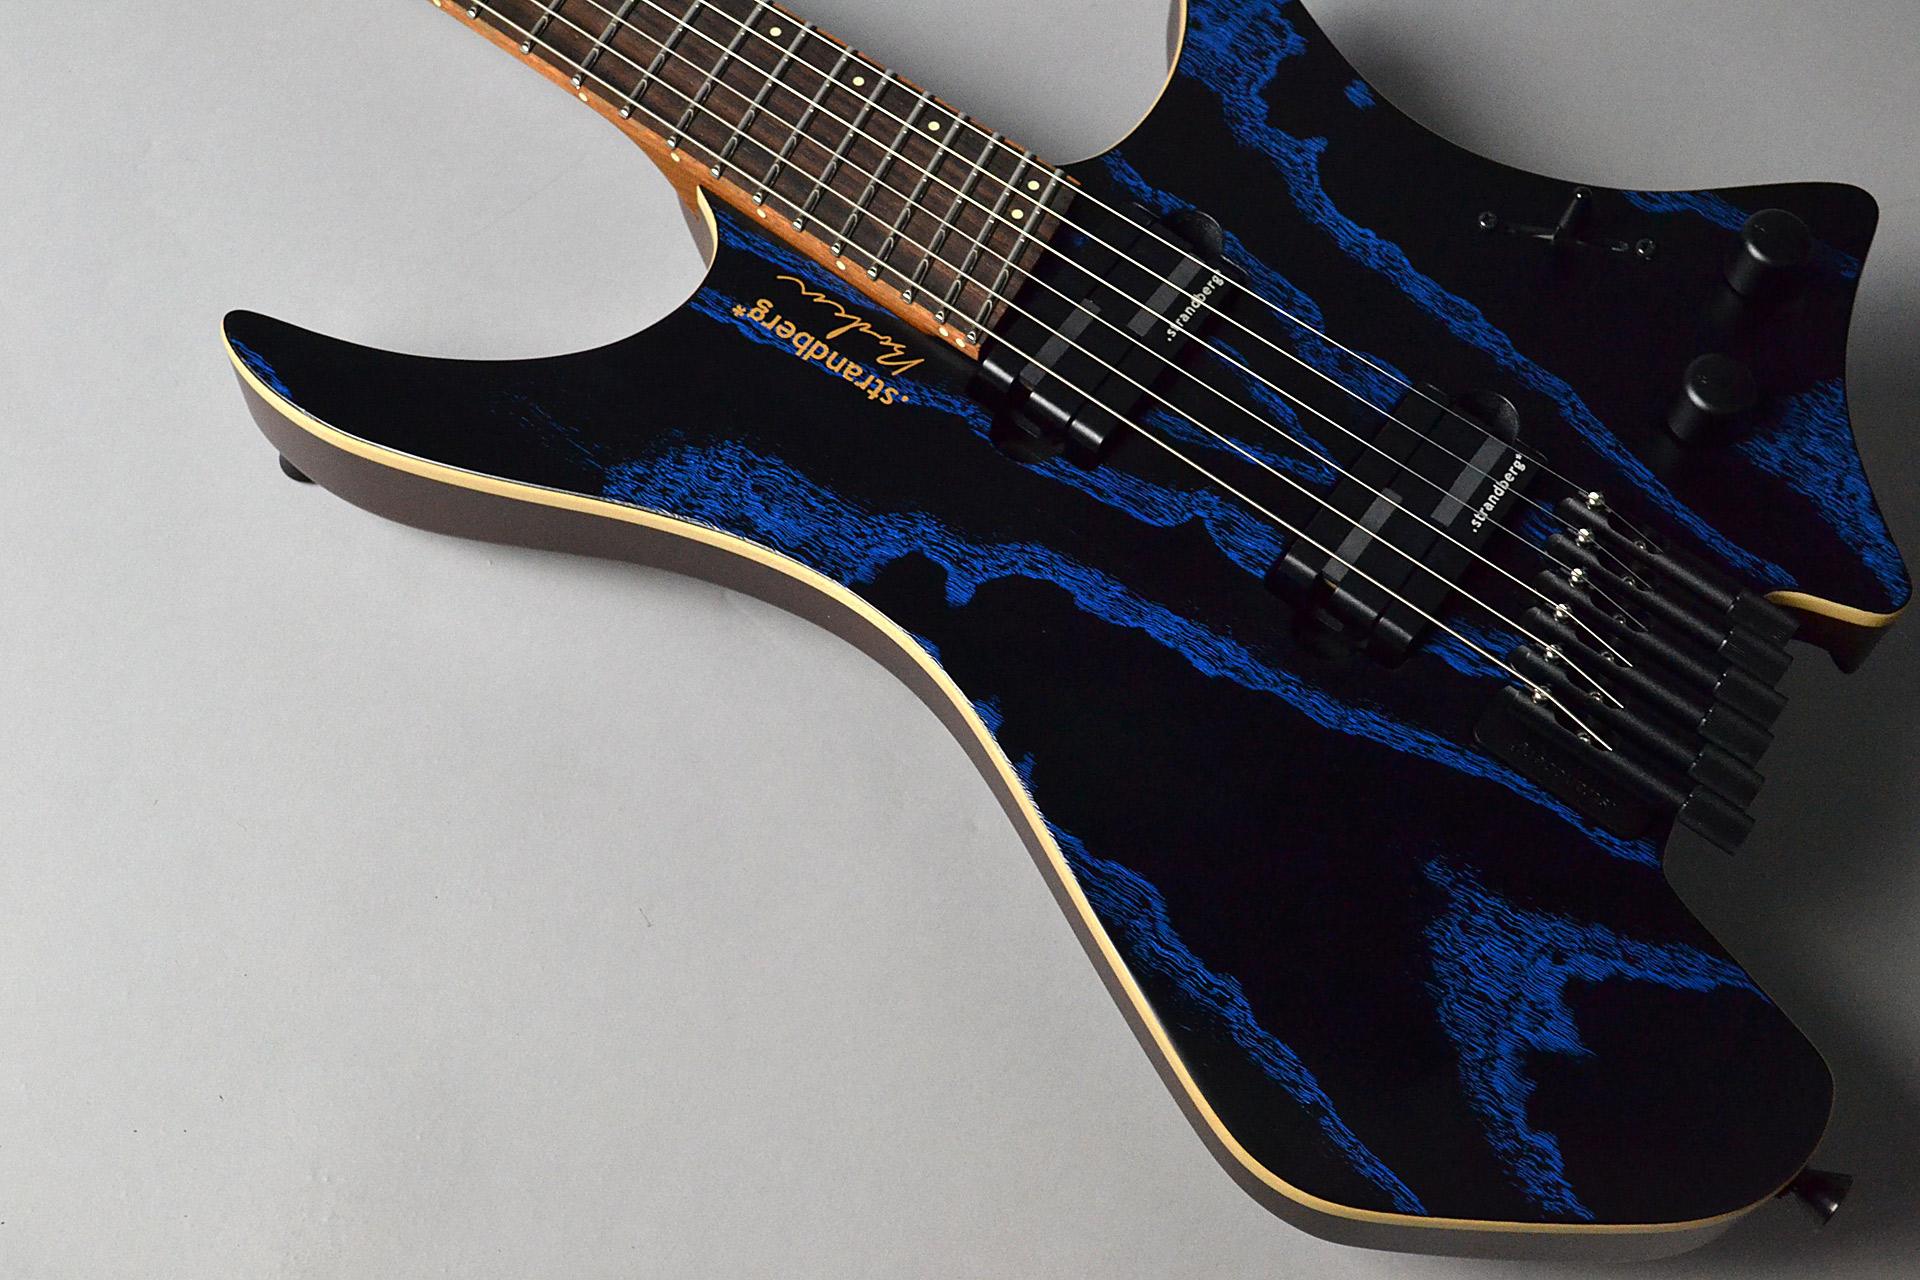 Boden J6 Standard Ash Illusion Blueのボディトップ-アップ画像